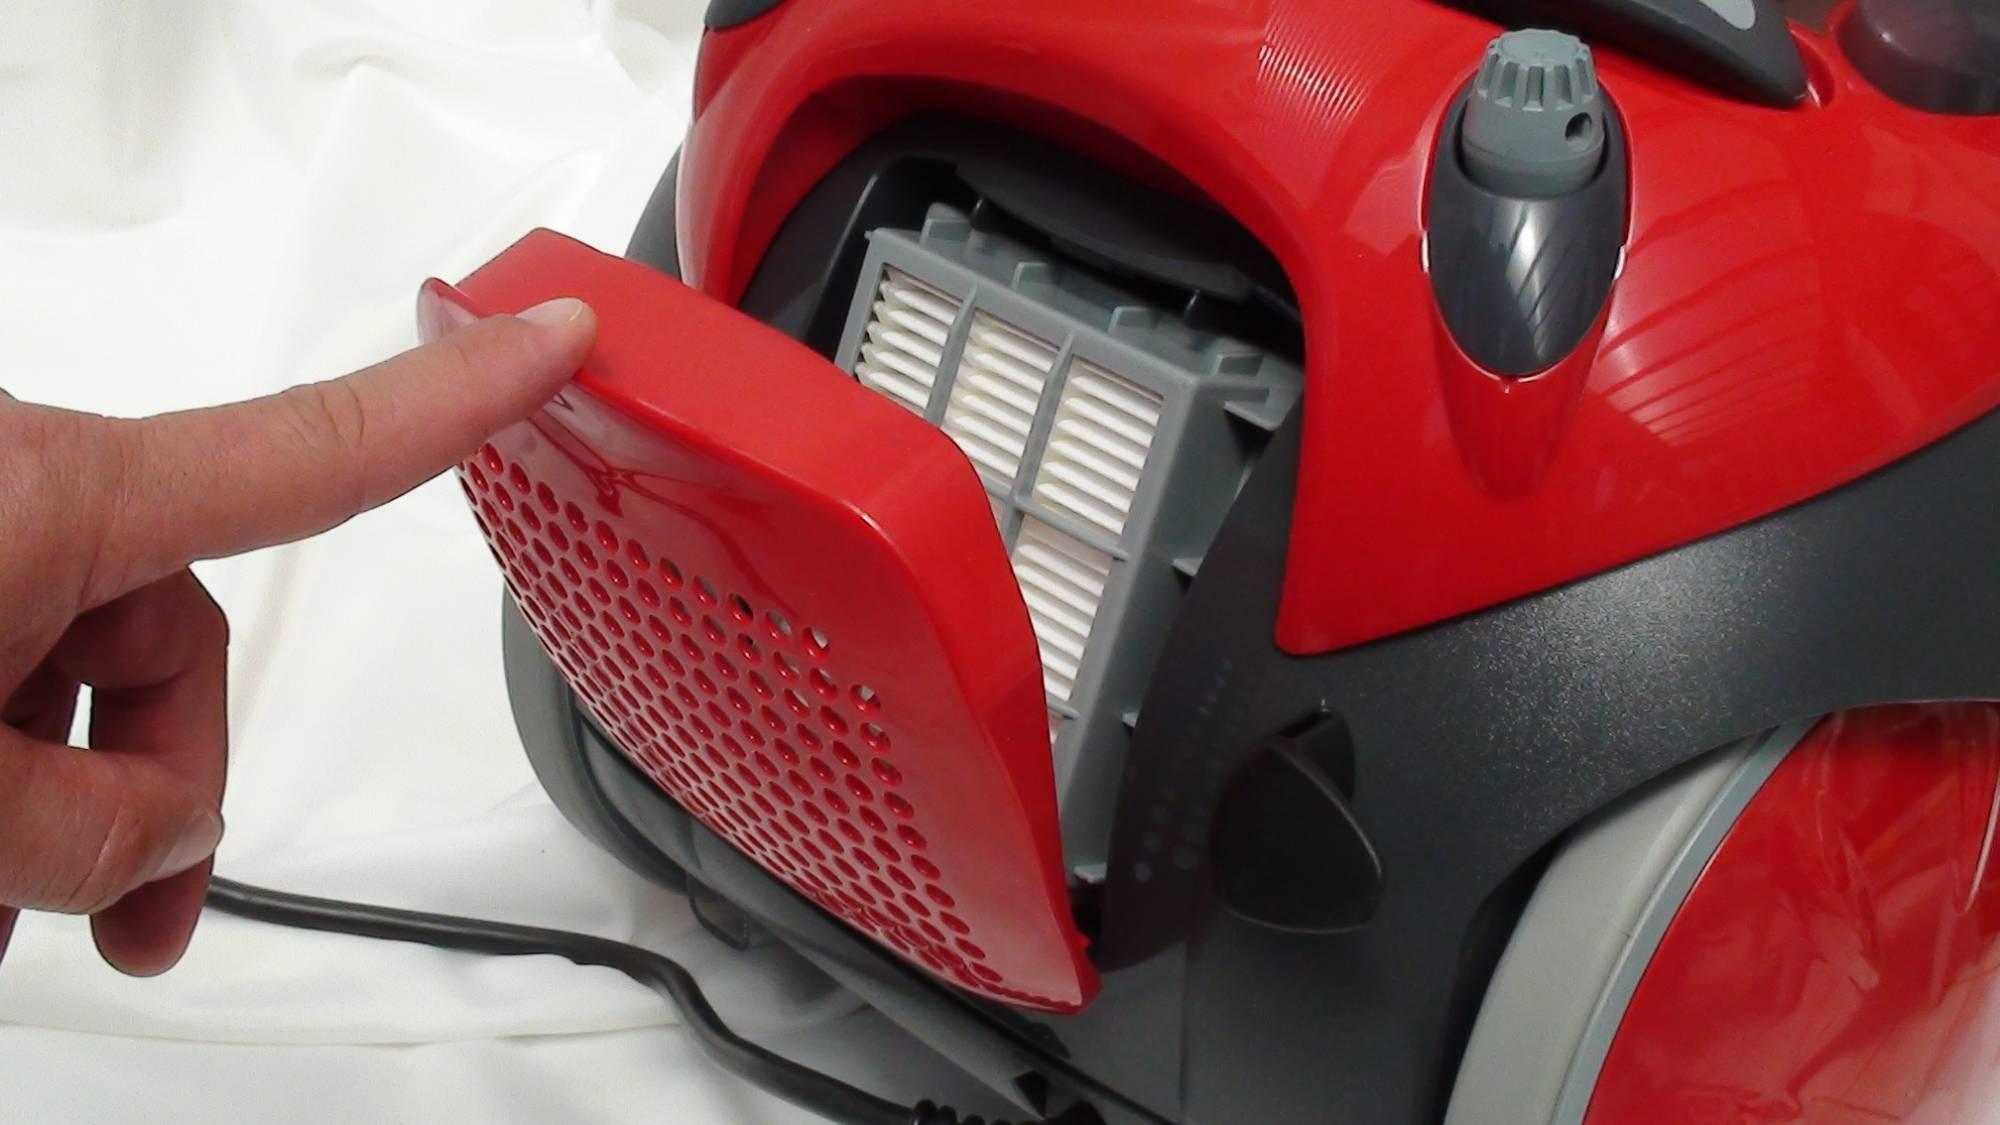 grille sortie d 39 air filtre hepa aspirateur nettoyeur vapeur spooty. Black Bedroom Furniture Sets. Home Design Ideas